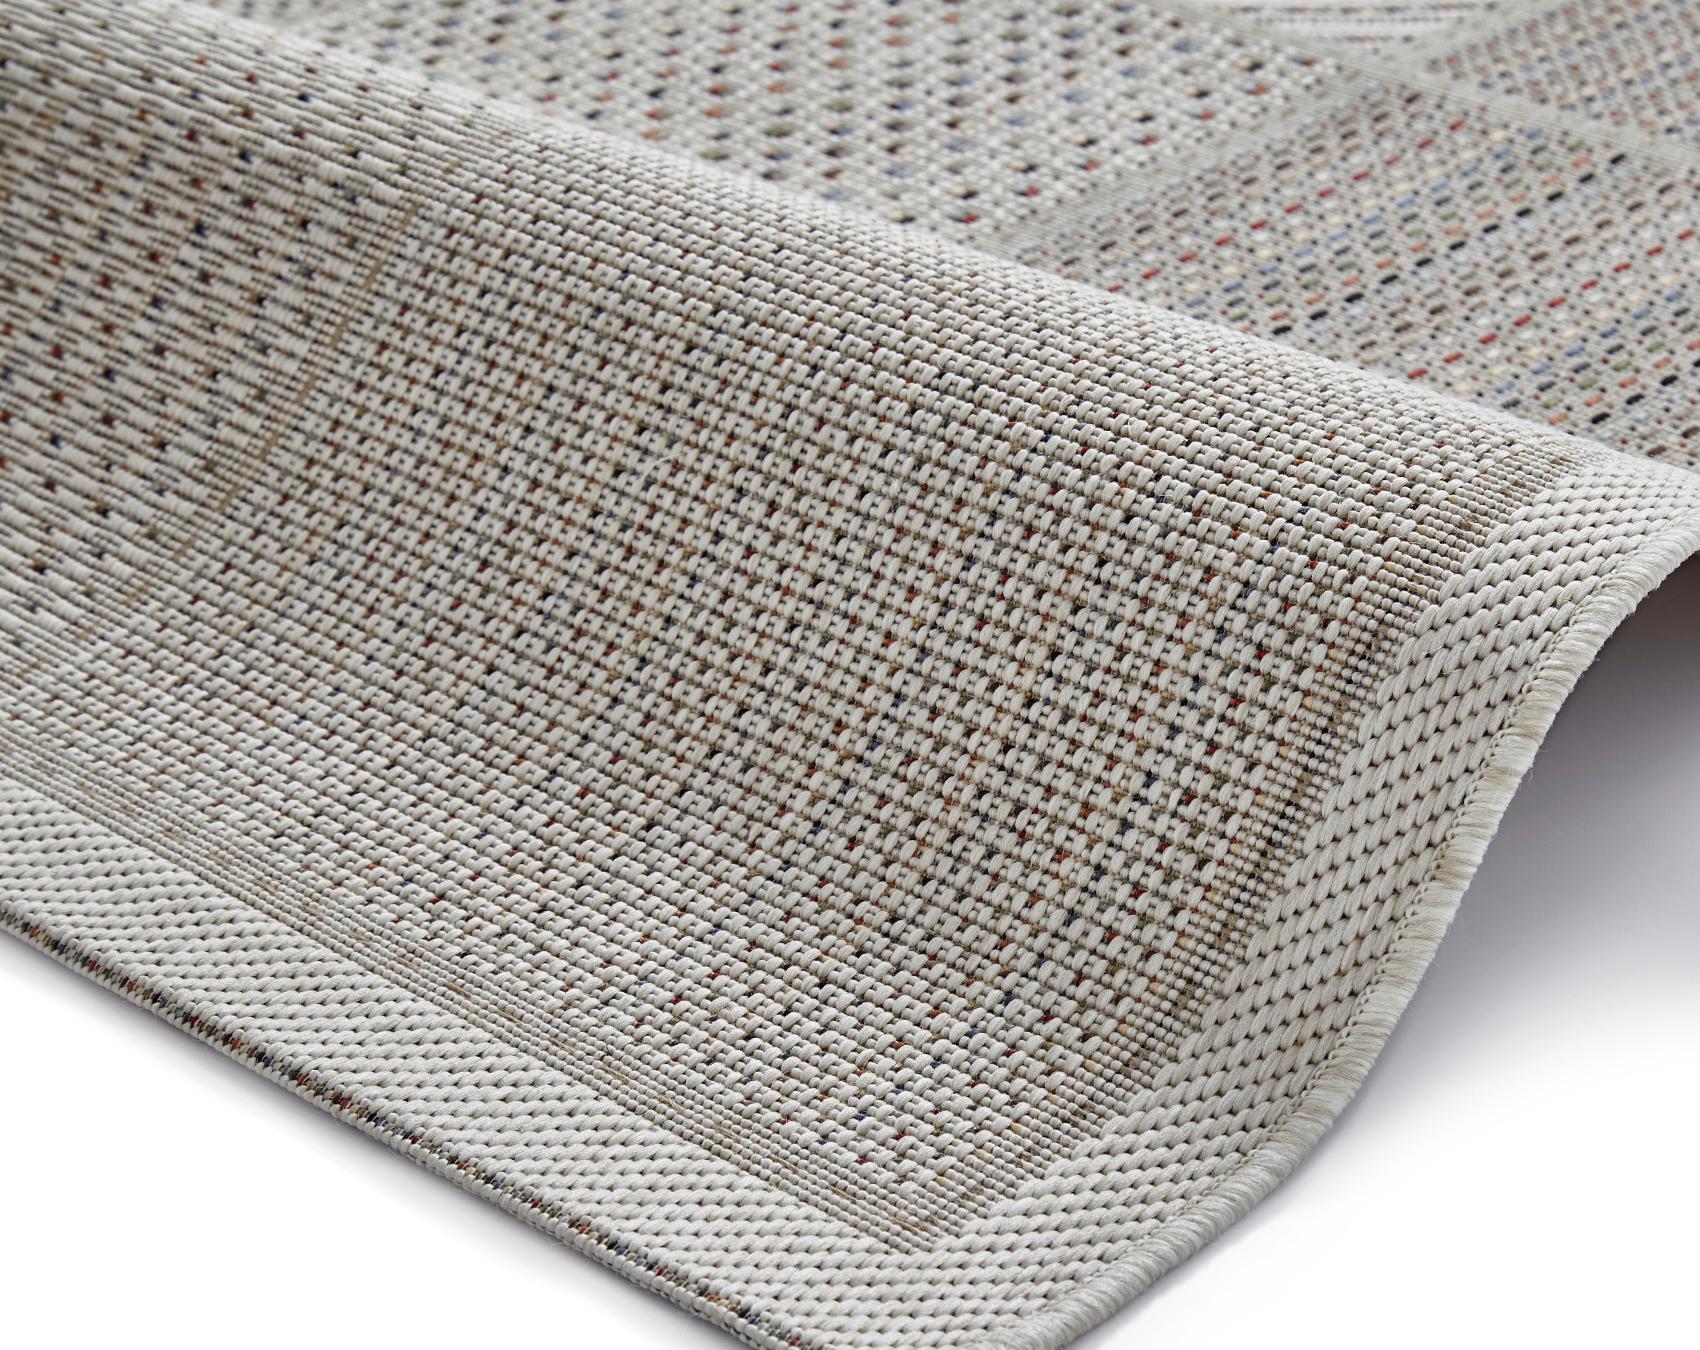 square grid pattern rug flat weave polypropylene neutral vegas mat  - item description